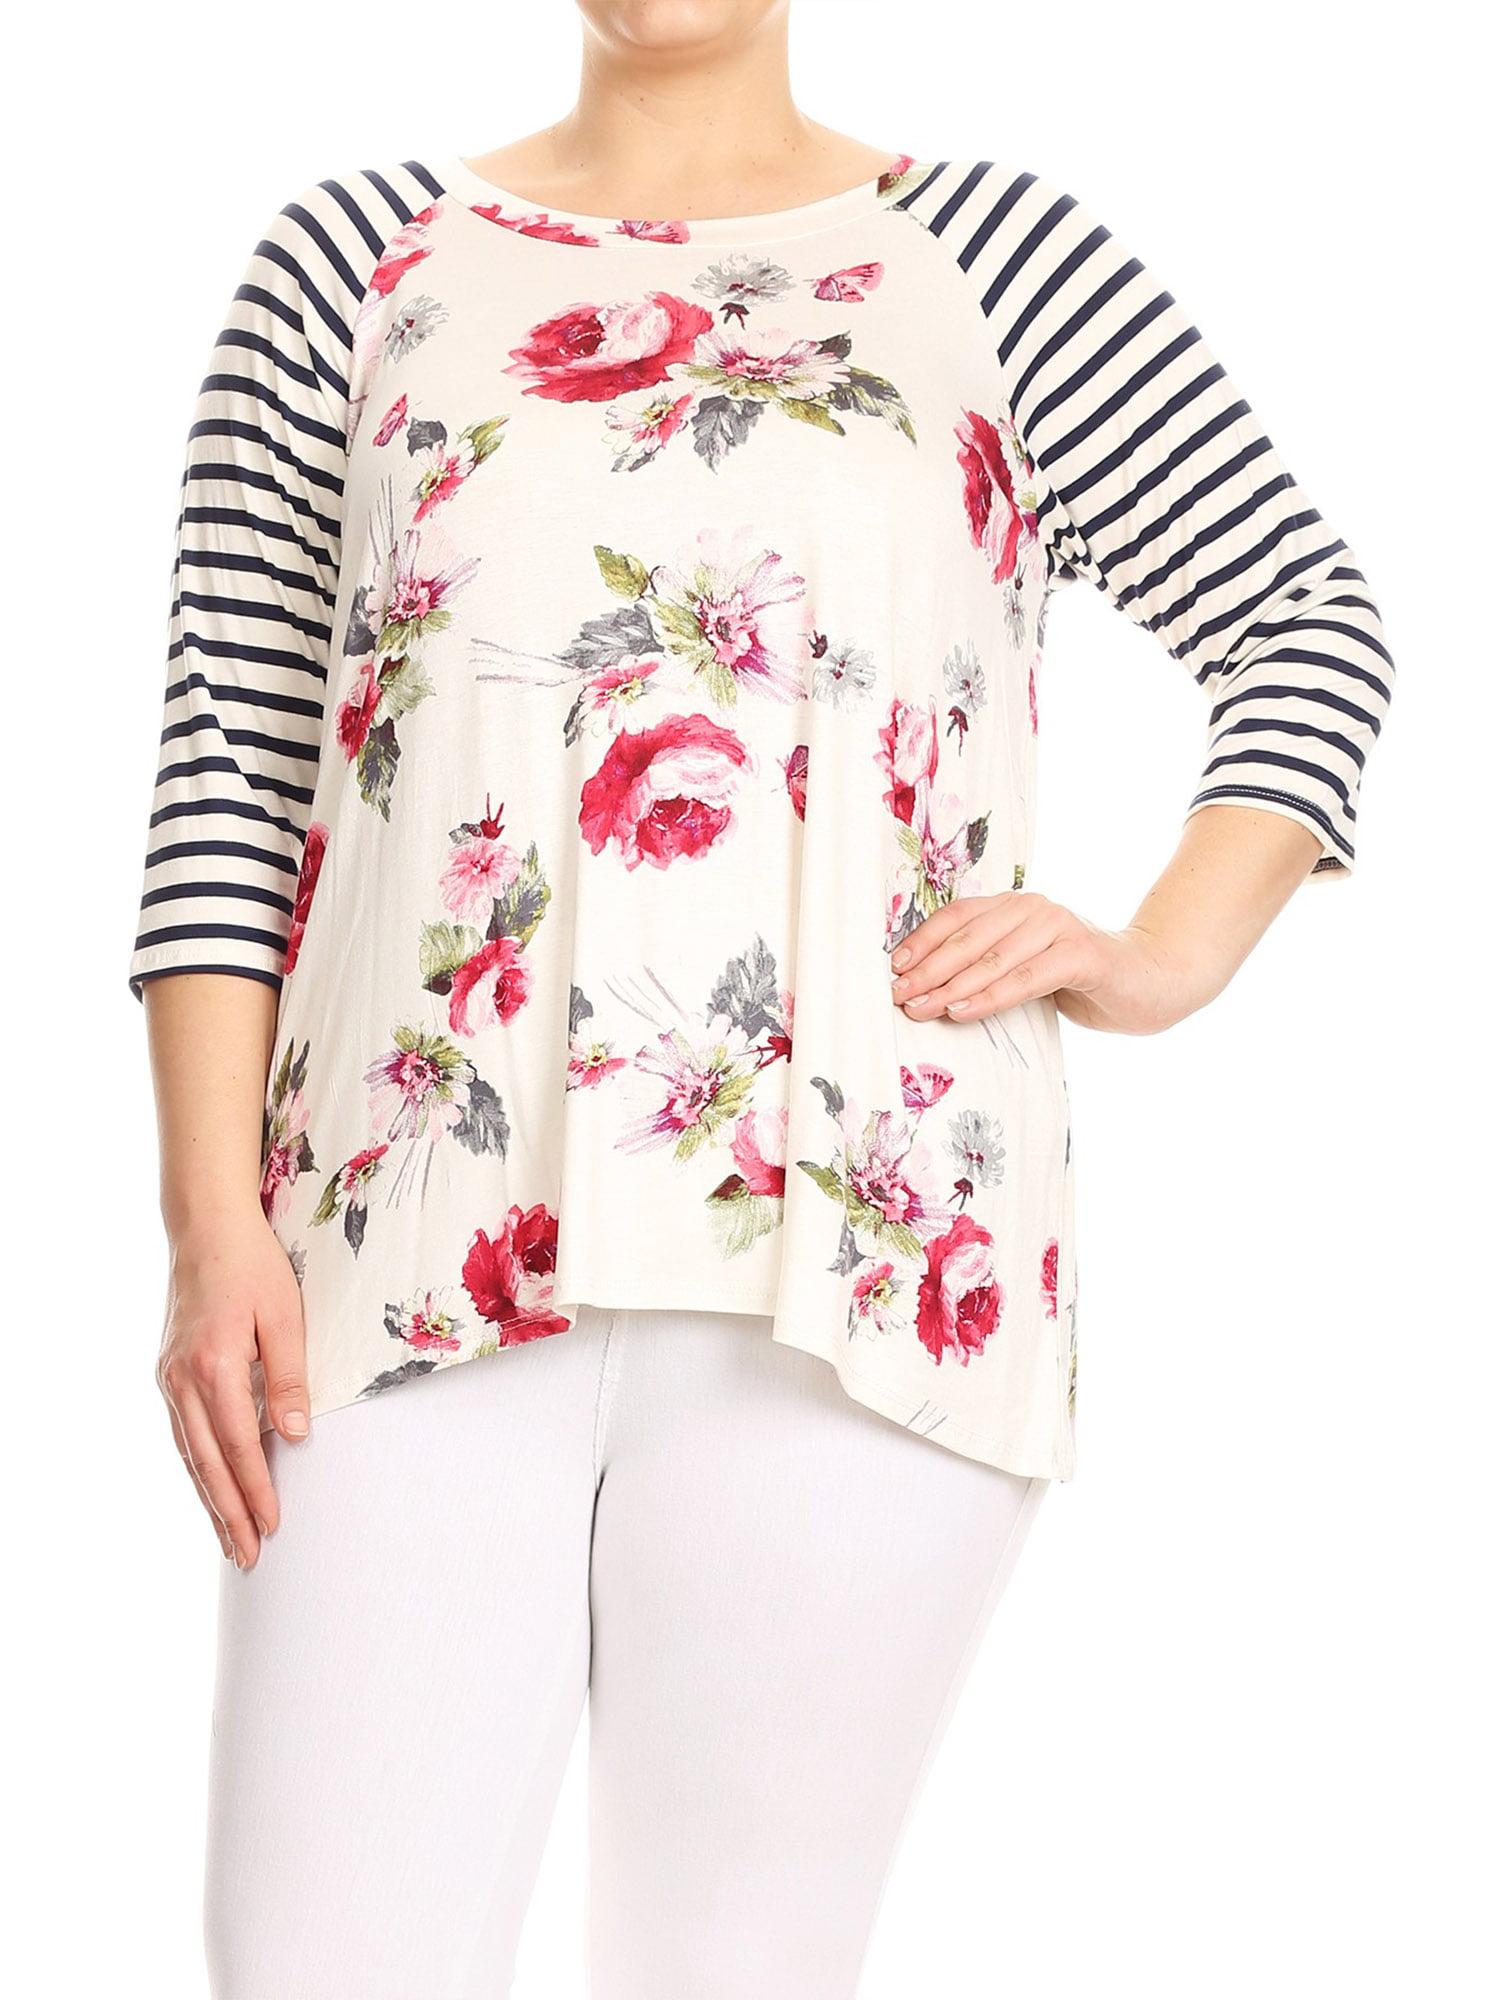 Plus Size Women's Trendy Style 3/4 Sleeves Print Top